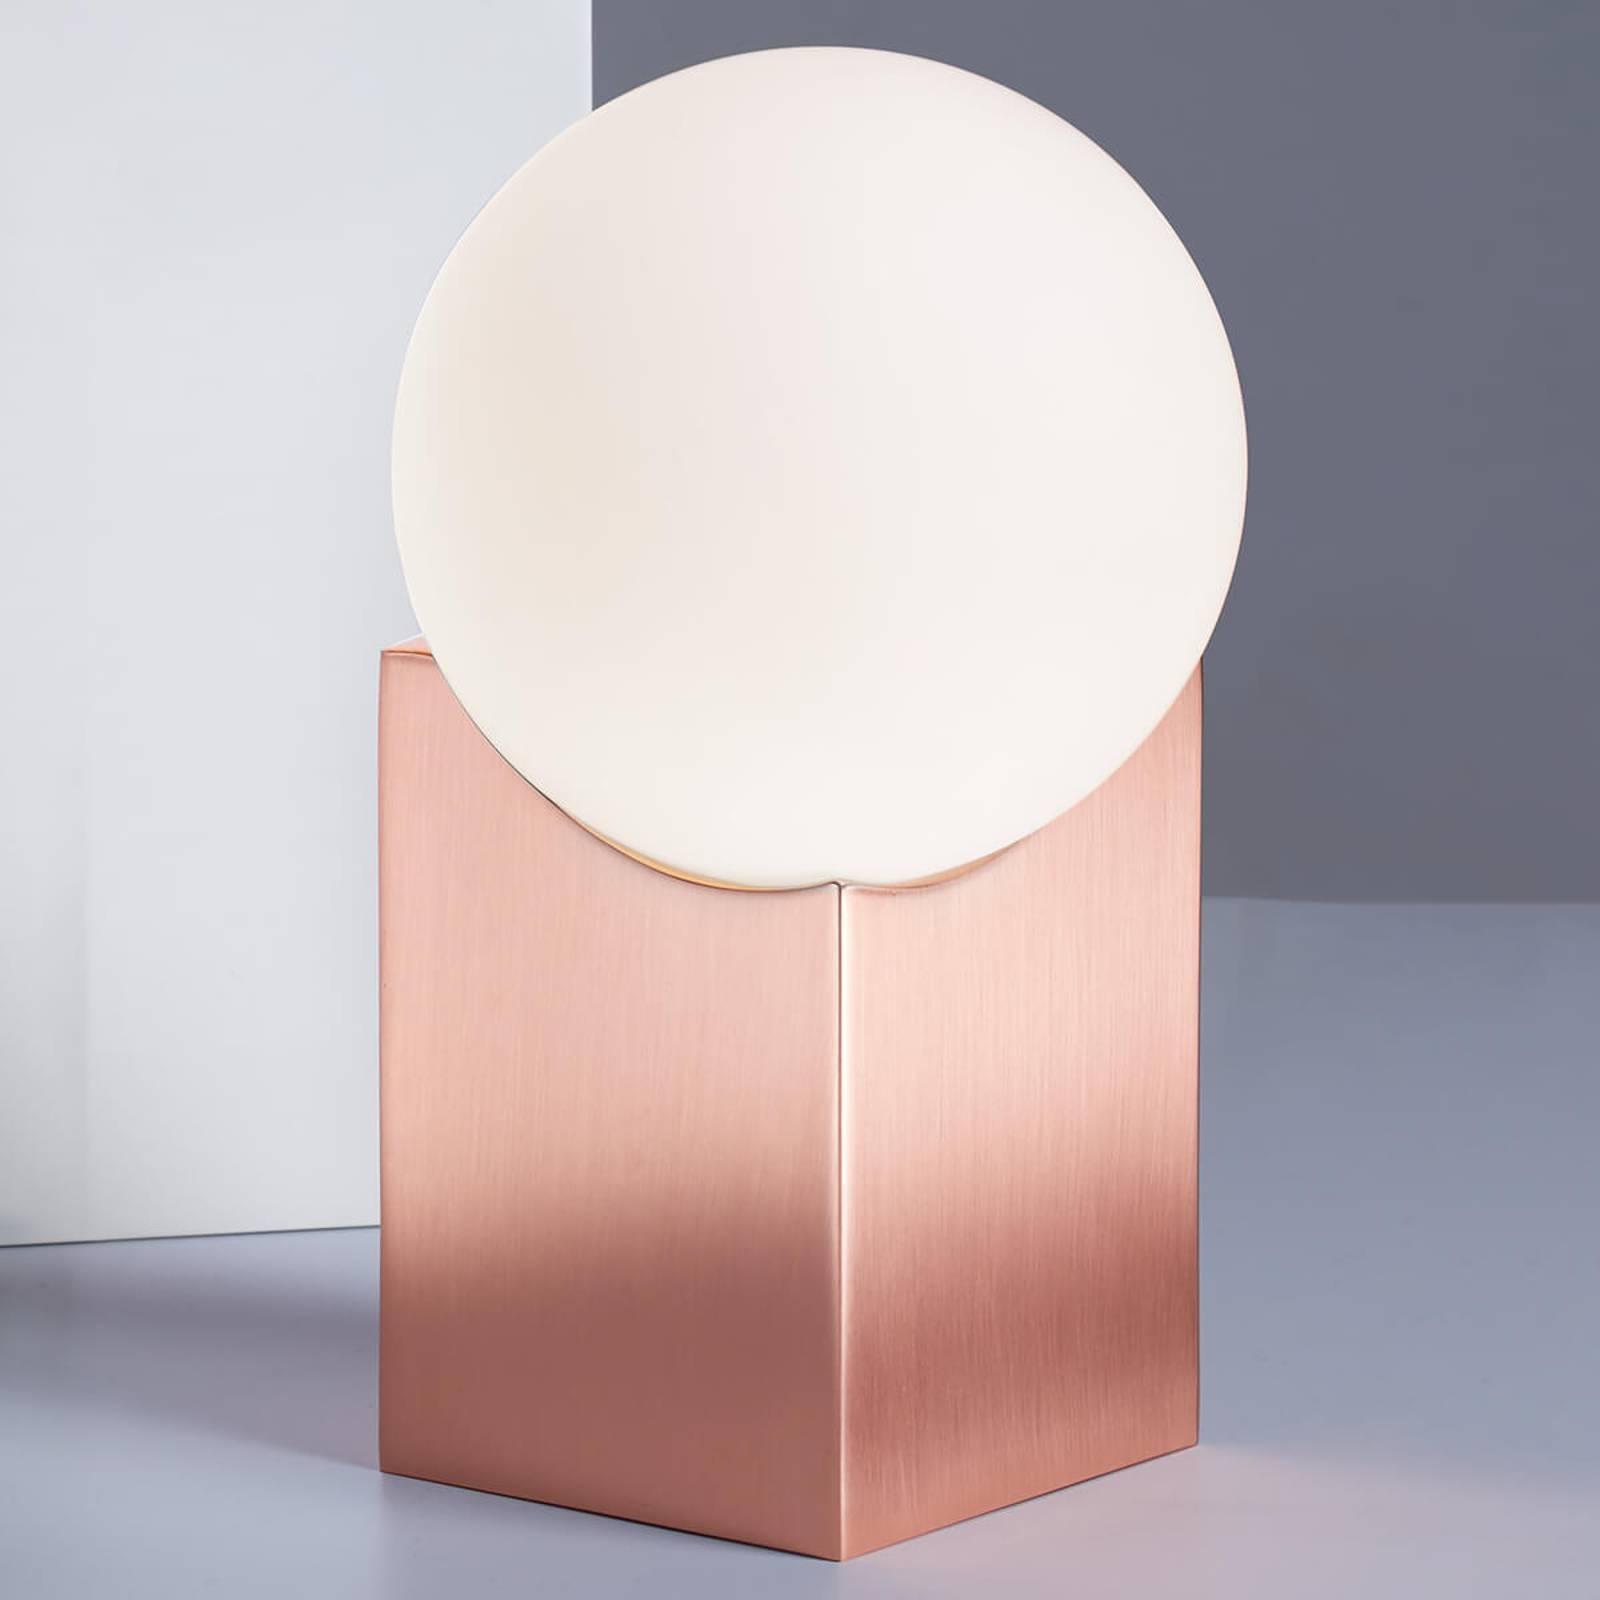 Pöytälamppu Cub 17,5 cm, kupari